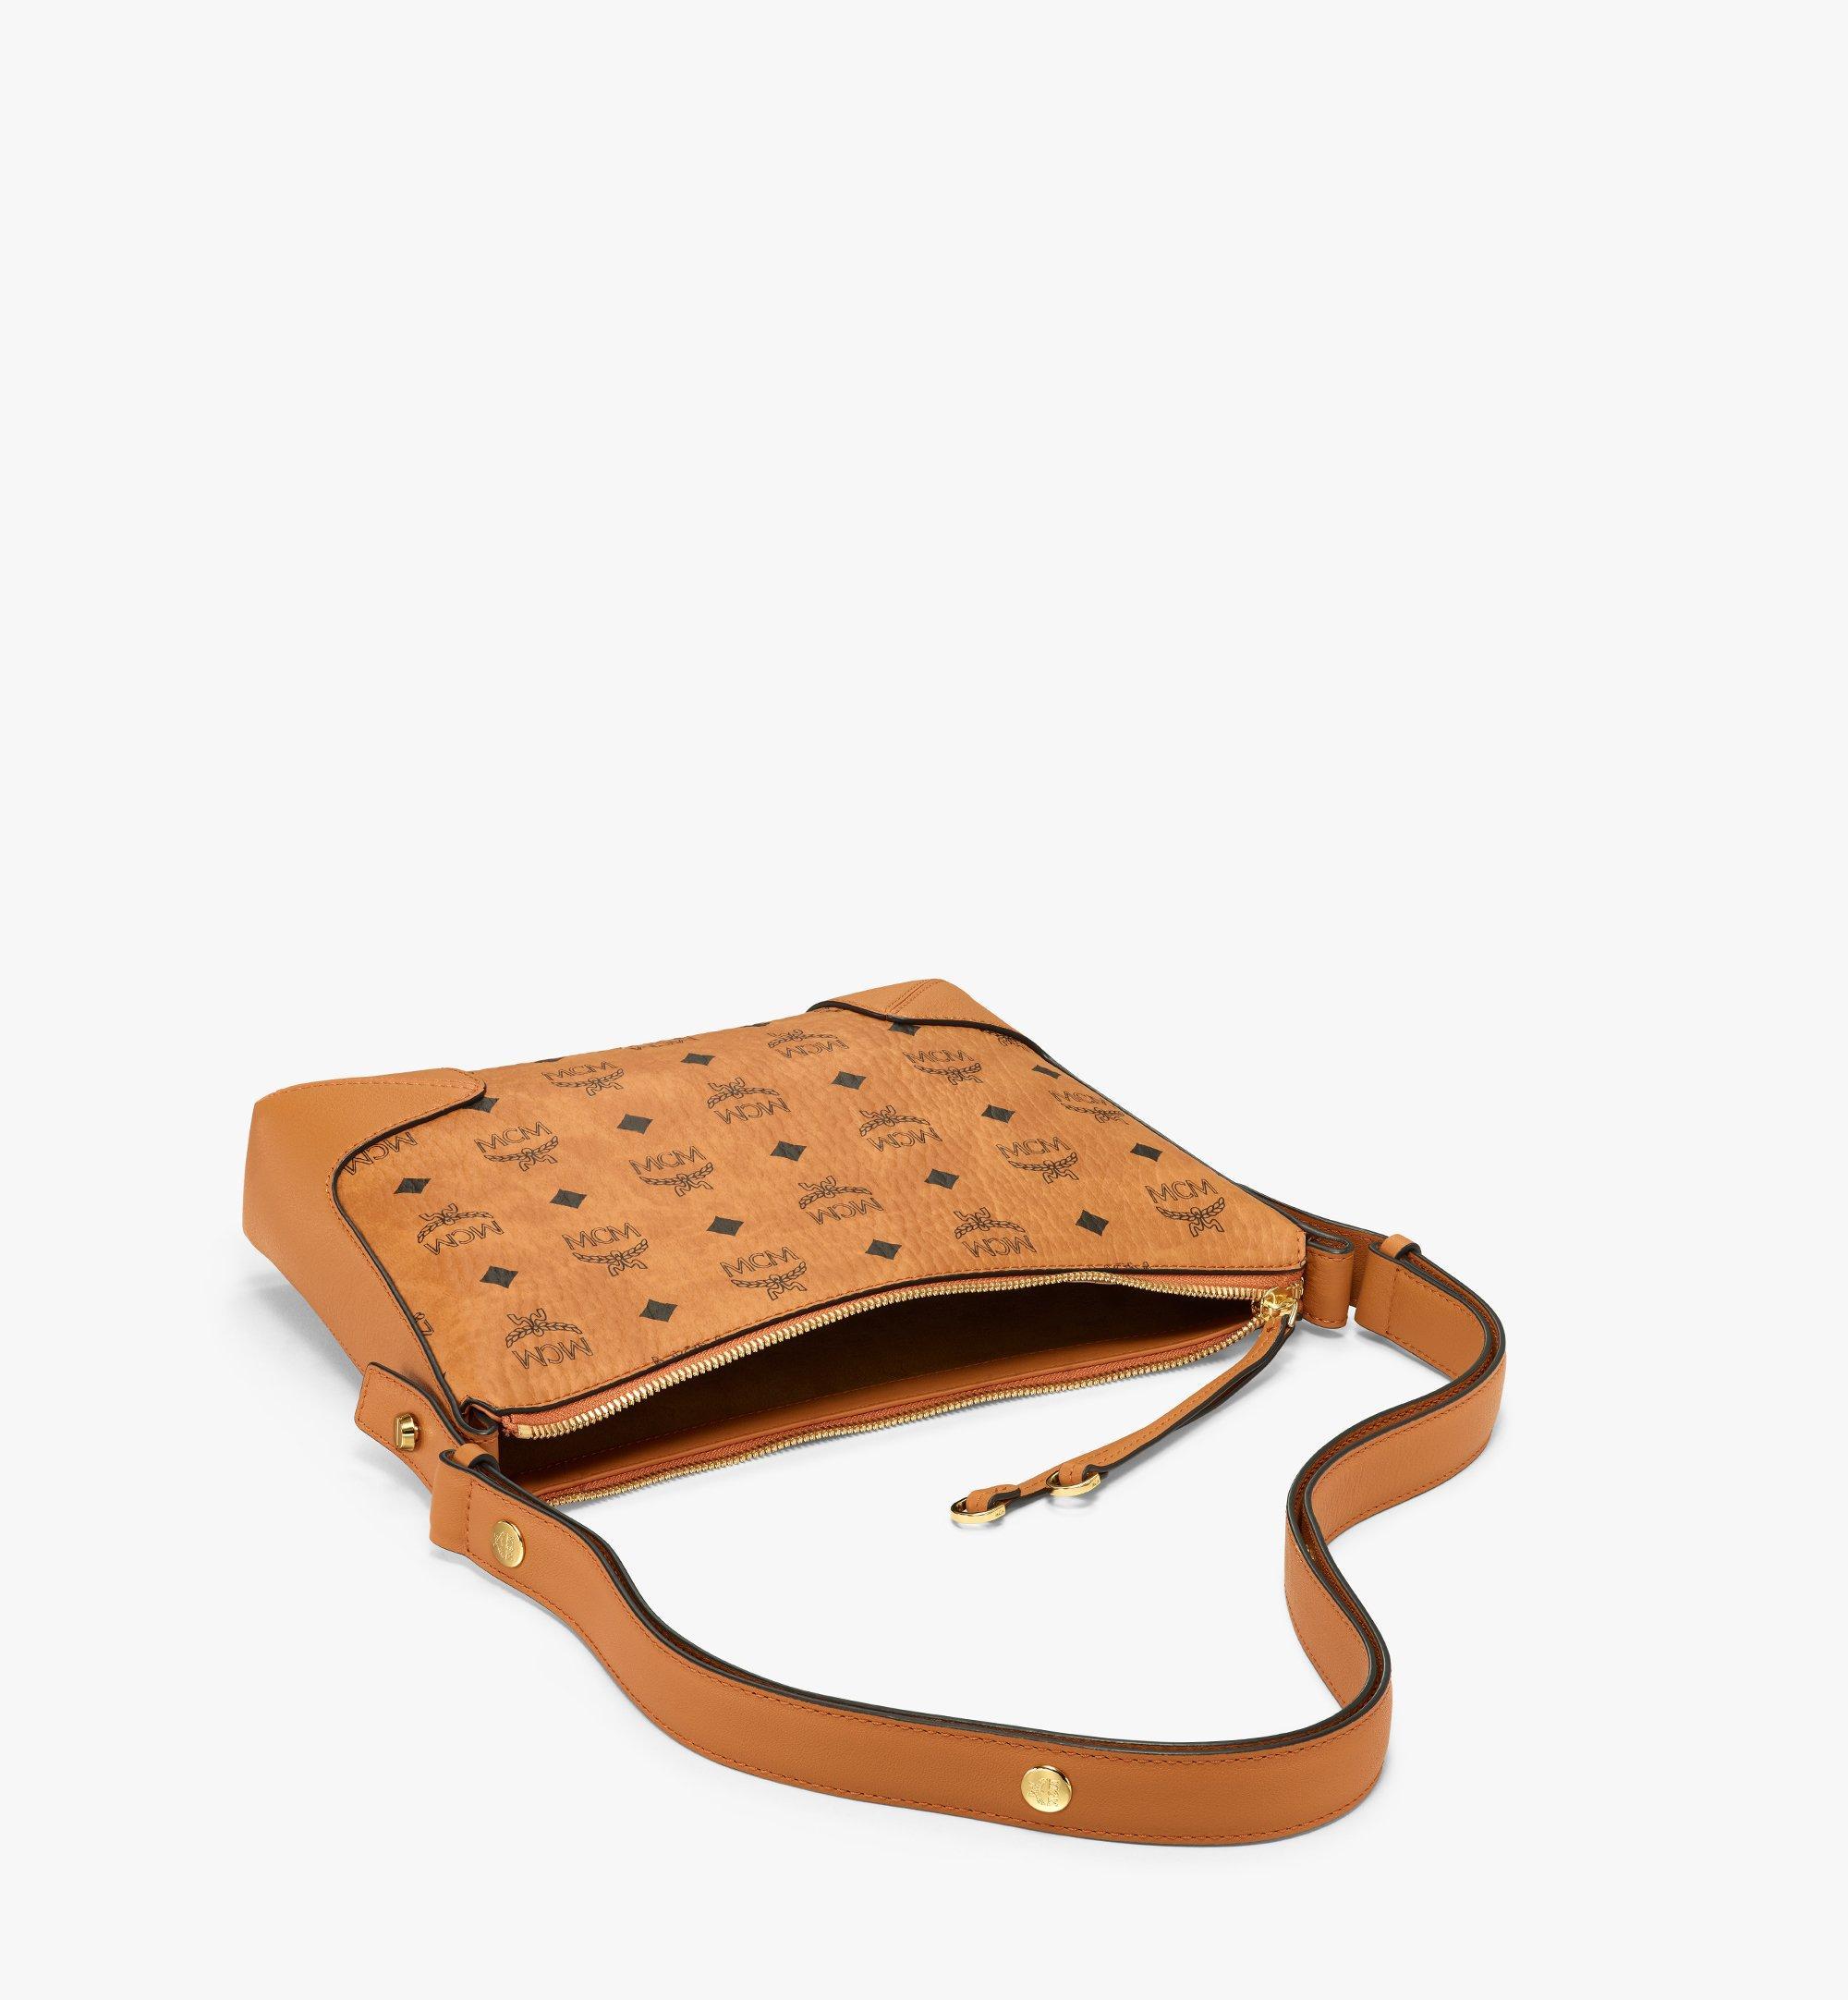 MCM Klara Shoulder Bag in Visetos Cognac MWSBSKM01CO001 Alternate View 2